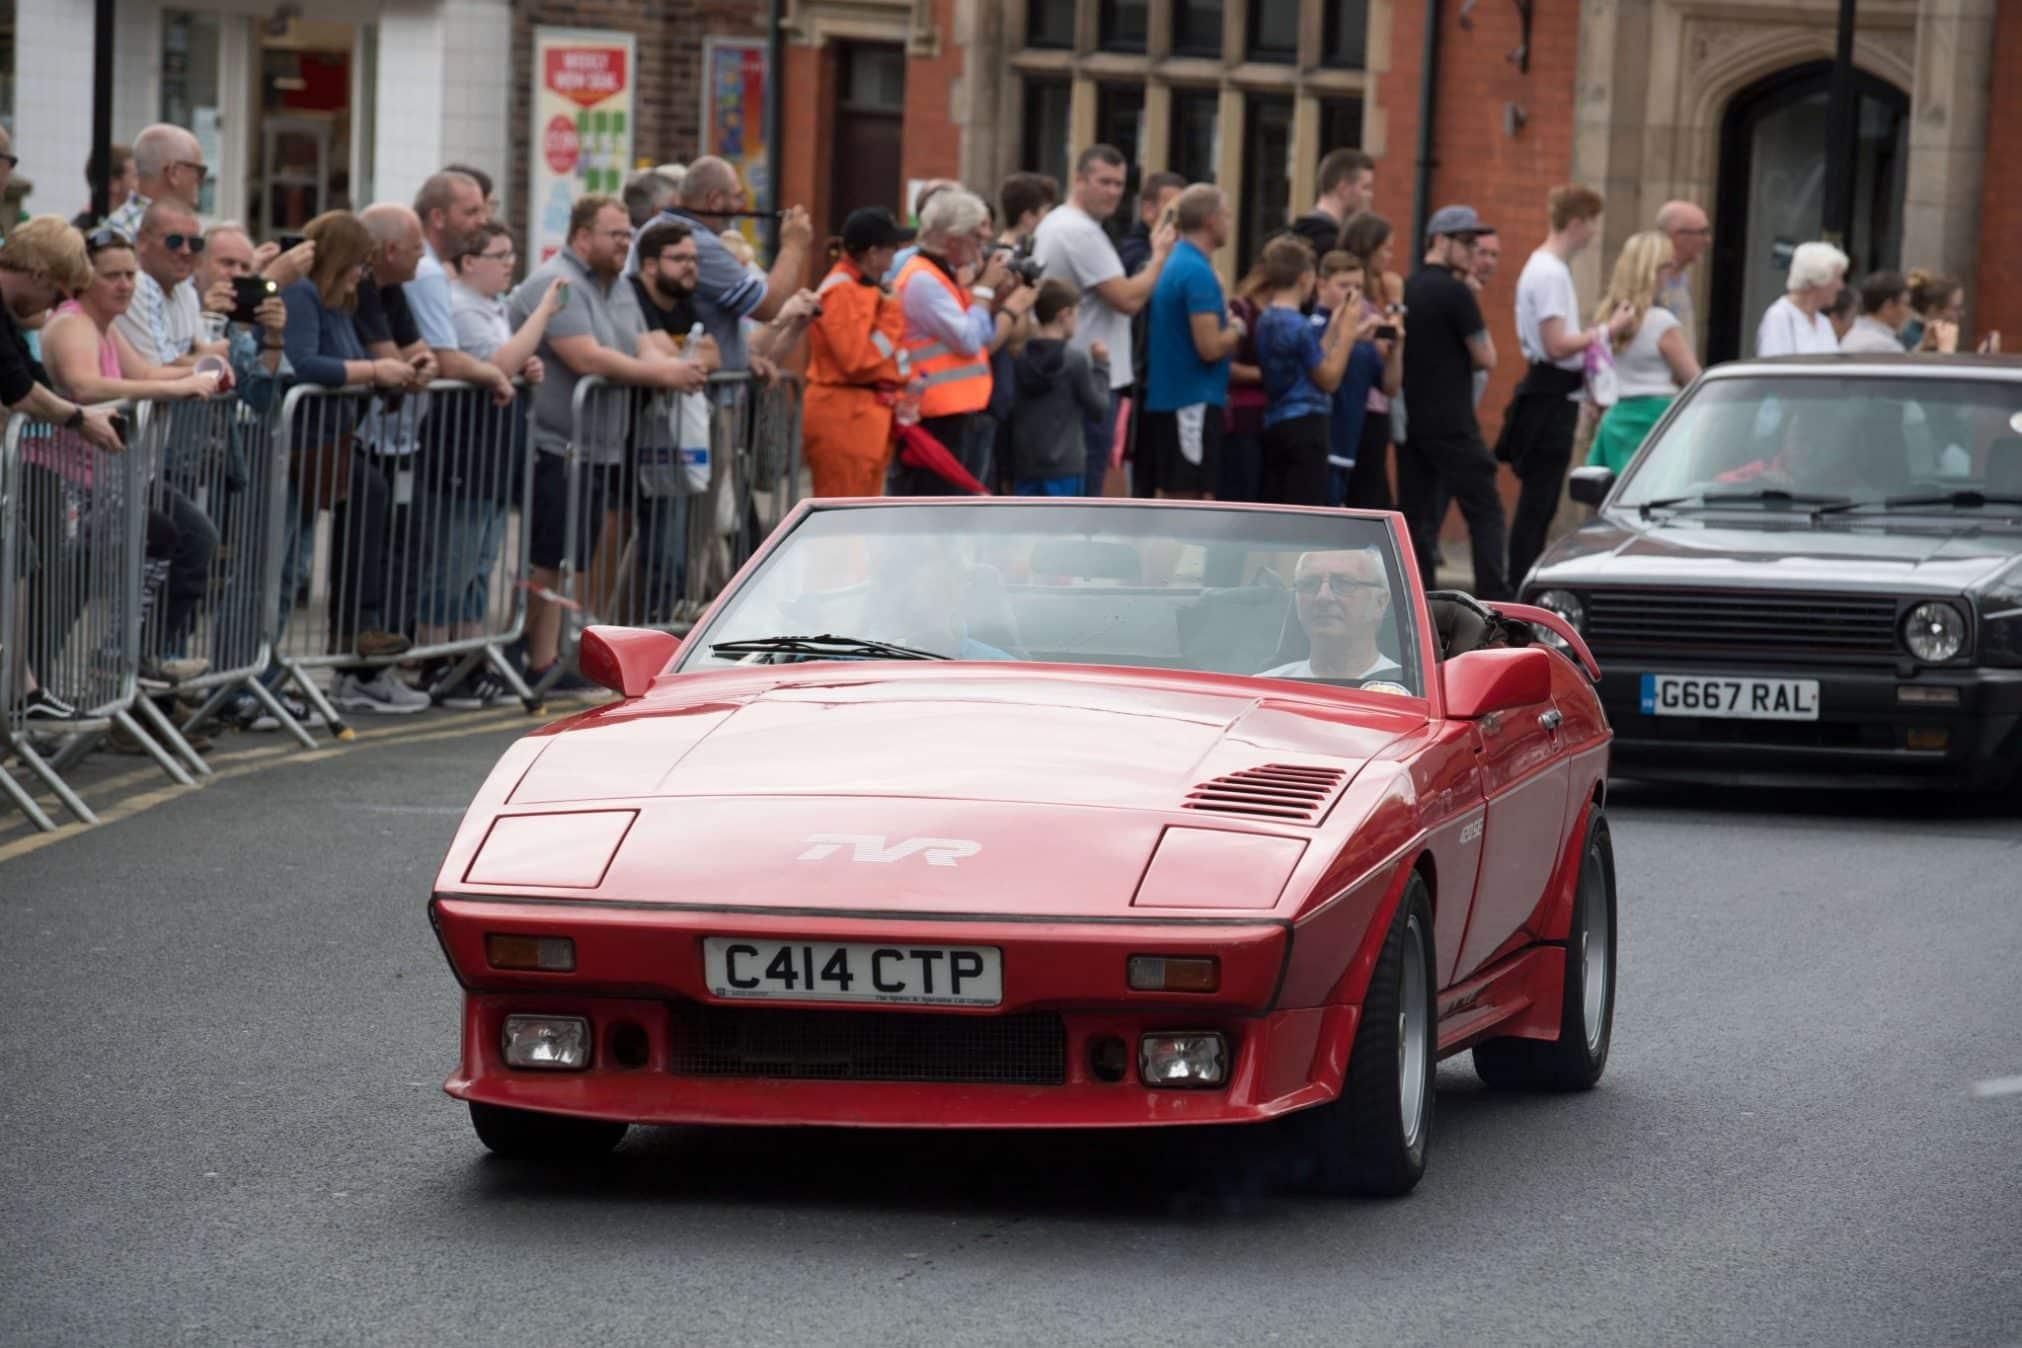 Motorfest Photographs 2017